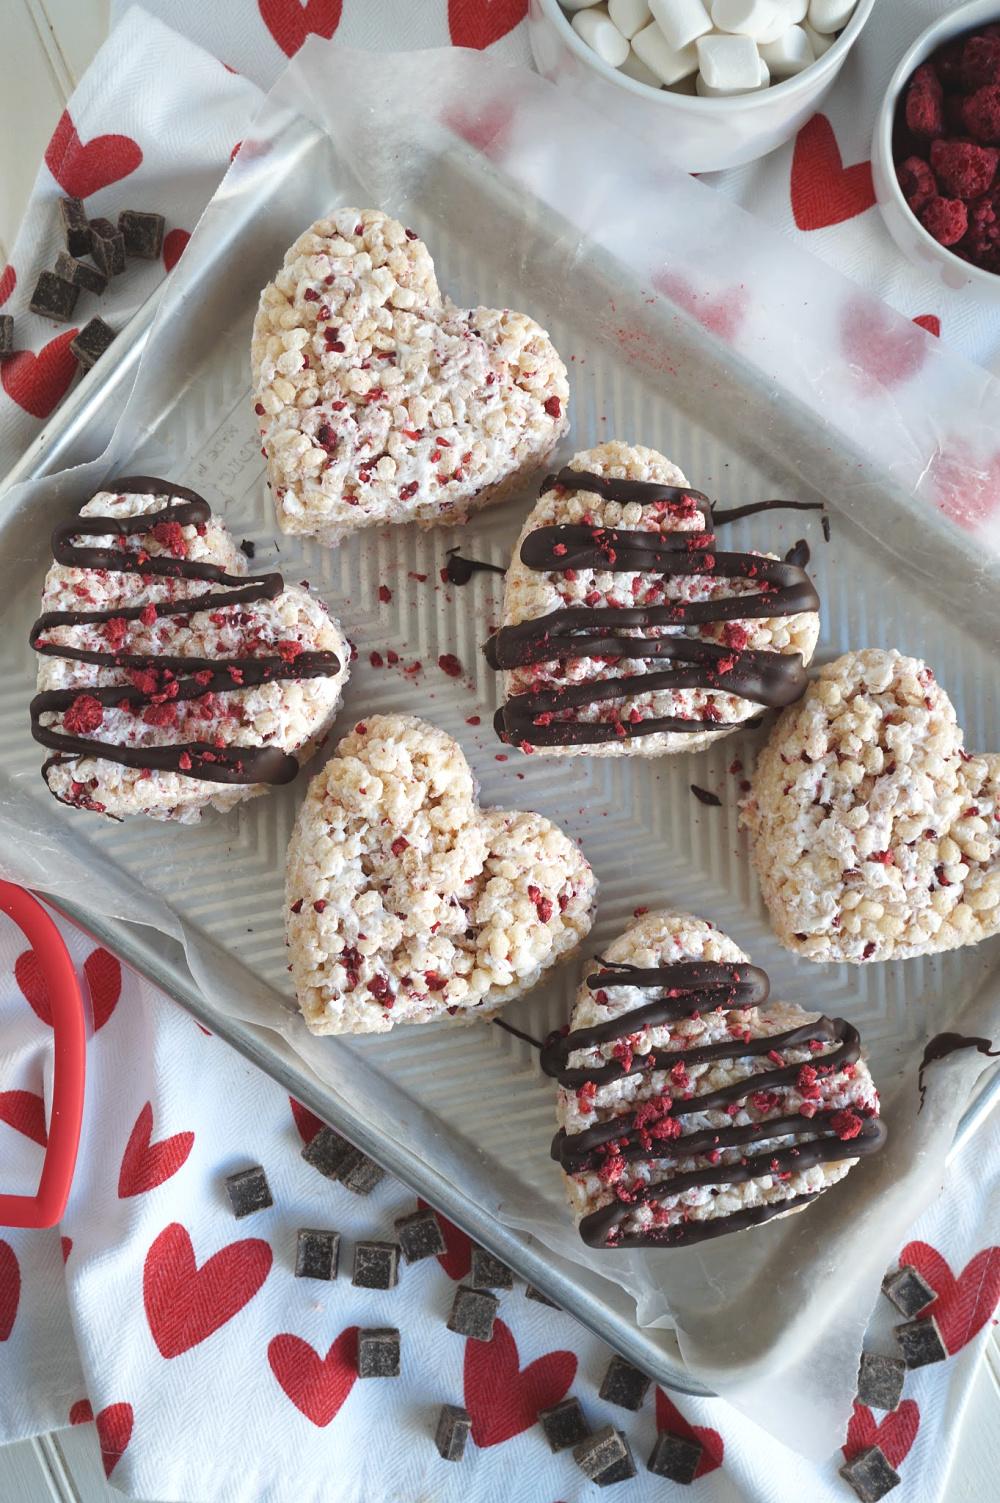 tray of raspberry dark chocolate rice krispie treats